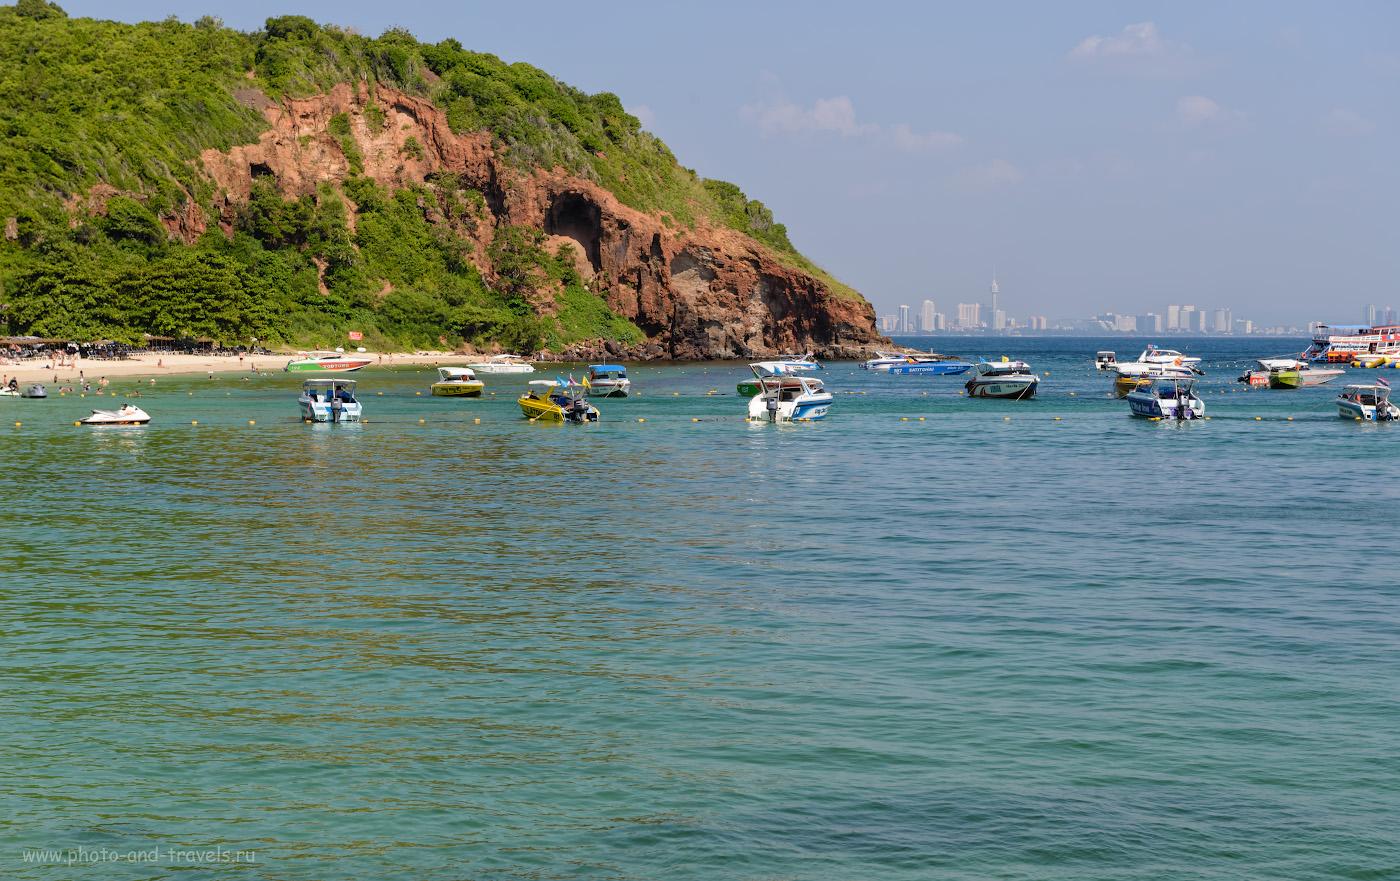 Фото 16. Пляж Манки Бич (Nual Beach) на острове Ко Лан. Там живут обезьяны. Где купаться в Паттайе. 1/320, -0.33, 8.0, 100, 70.